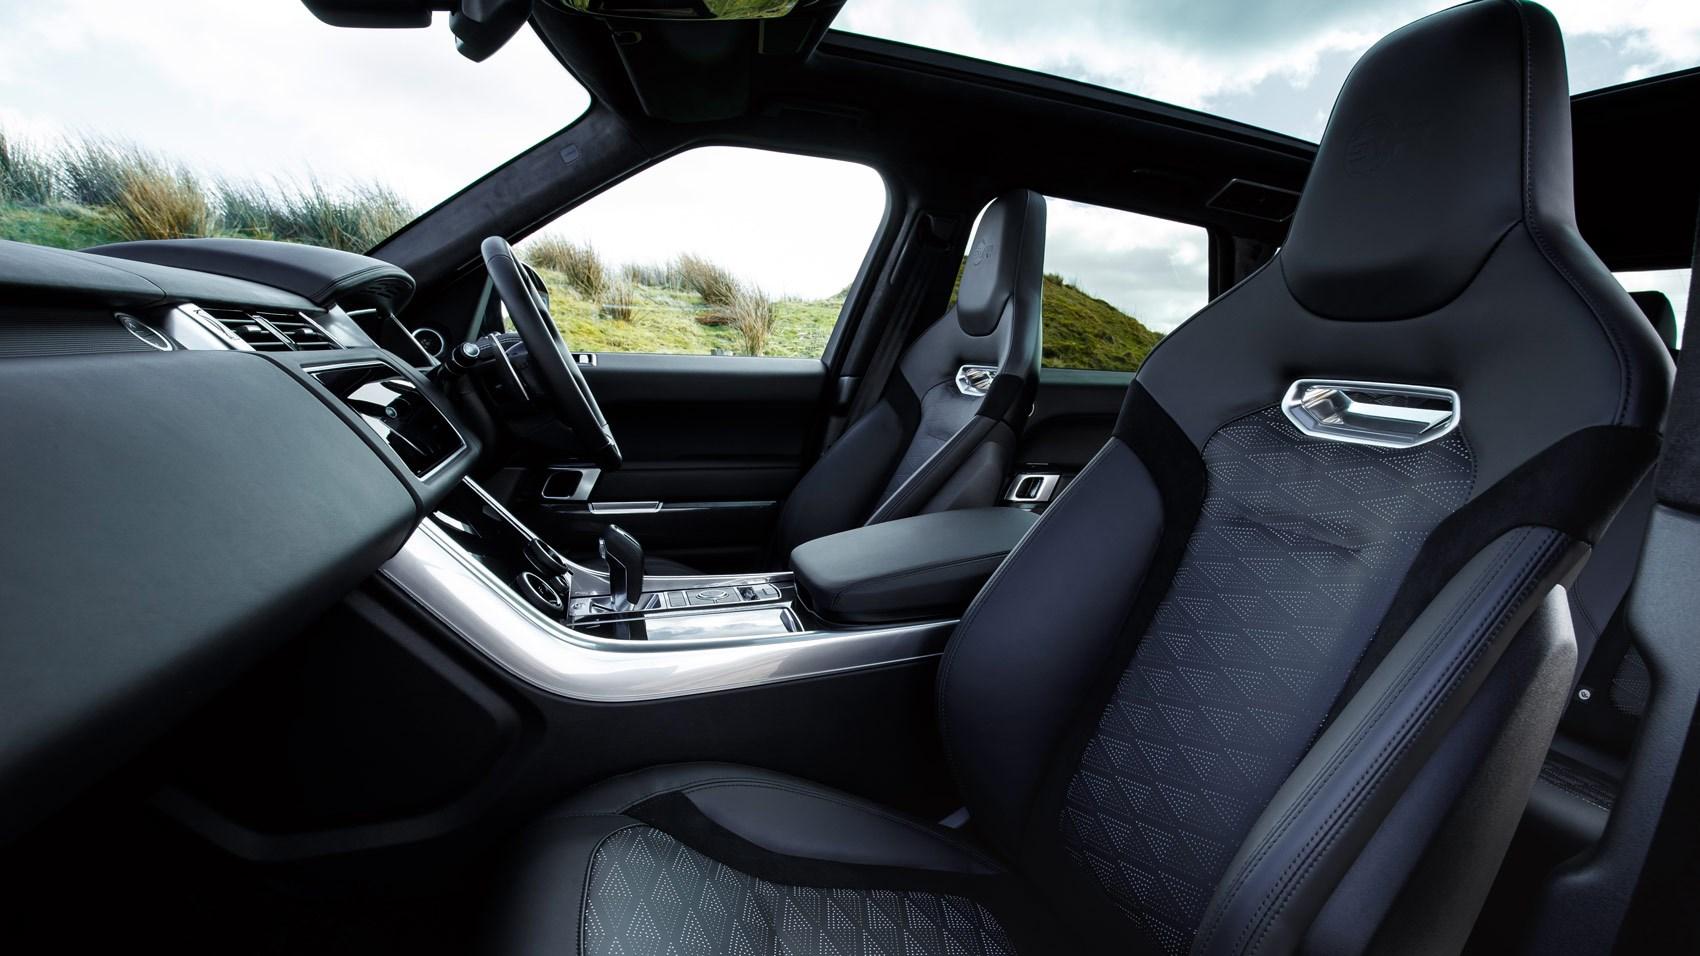 Range Rover Sport SVR 2018 interior